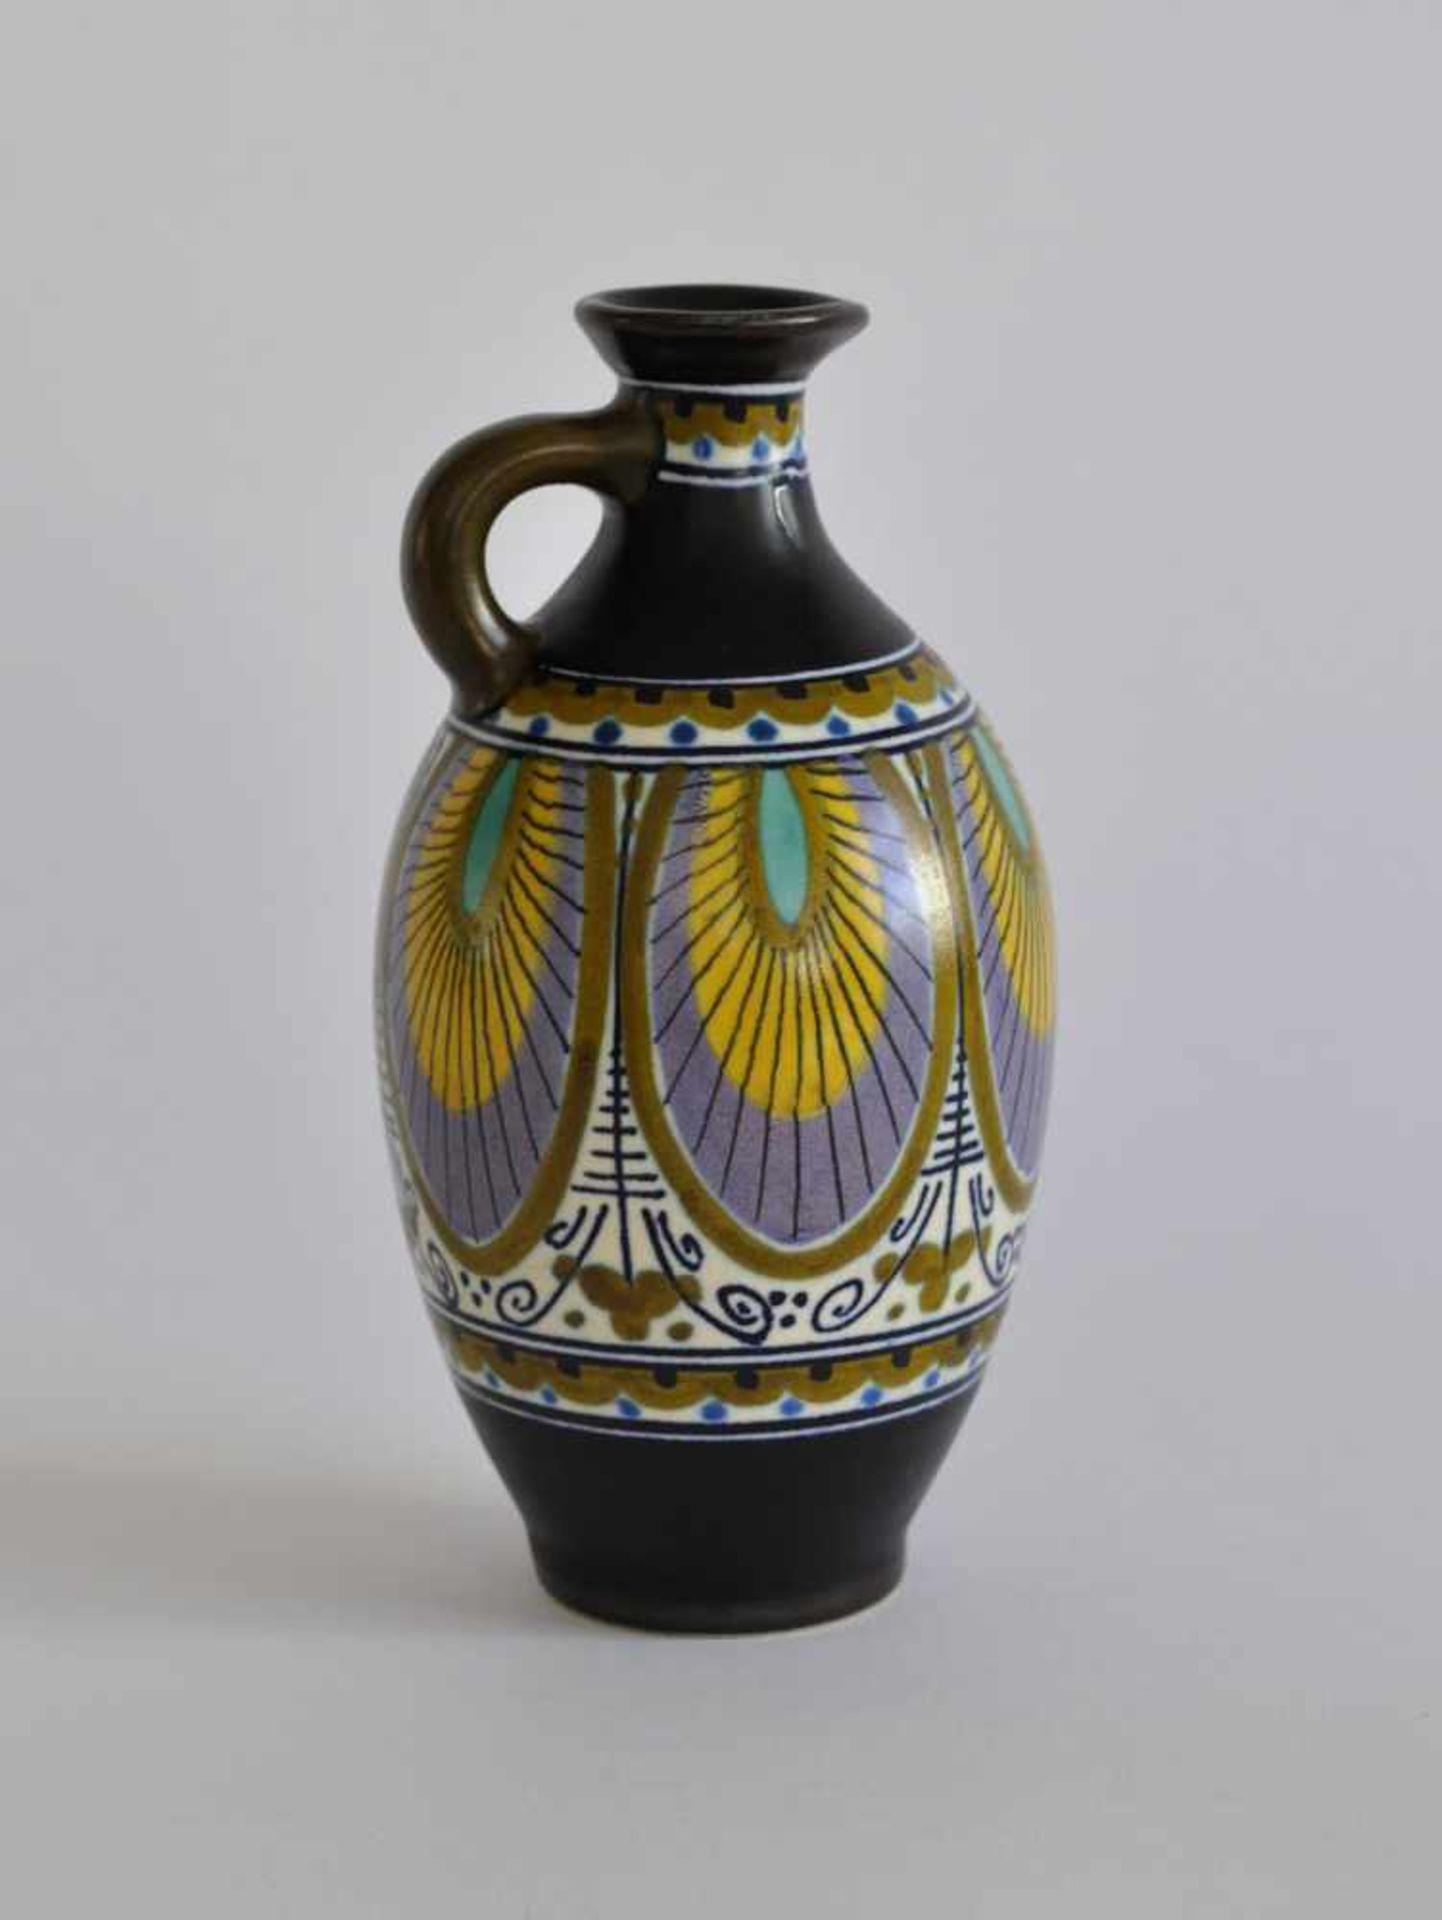 HENKELKANNE, Manufaktur Plateelbakkerij Zuid-Holland/ Gouda, 1920er-Jahre, Art Deco-Epoche, Fayence,